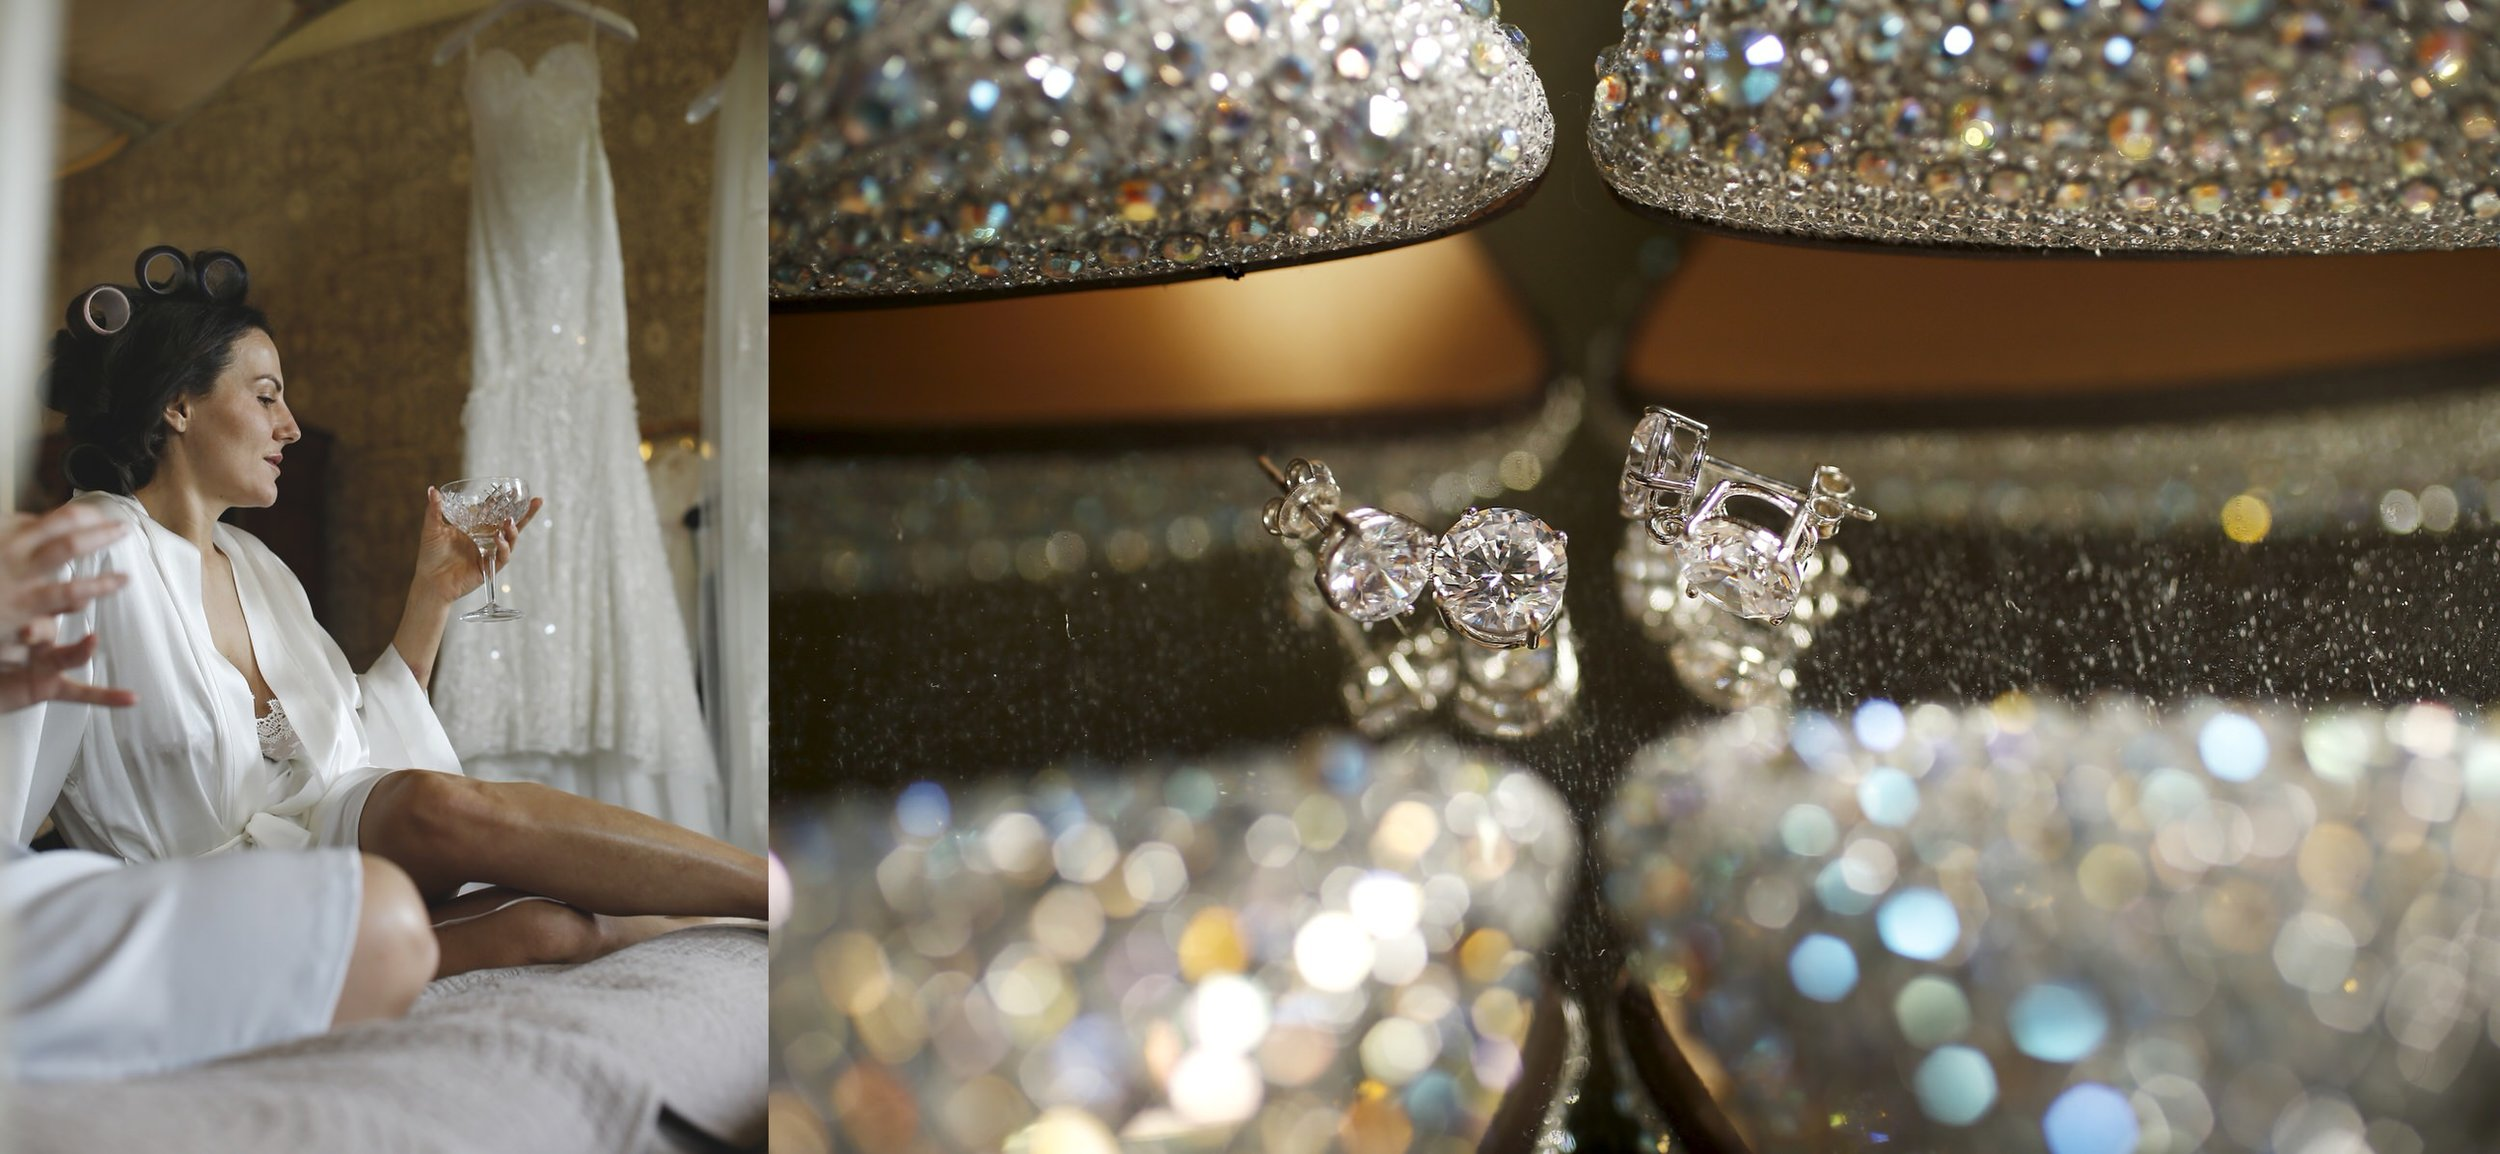 brettharkness-luxury-wedding-photographer-uk_0006.jpg